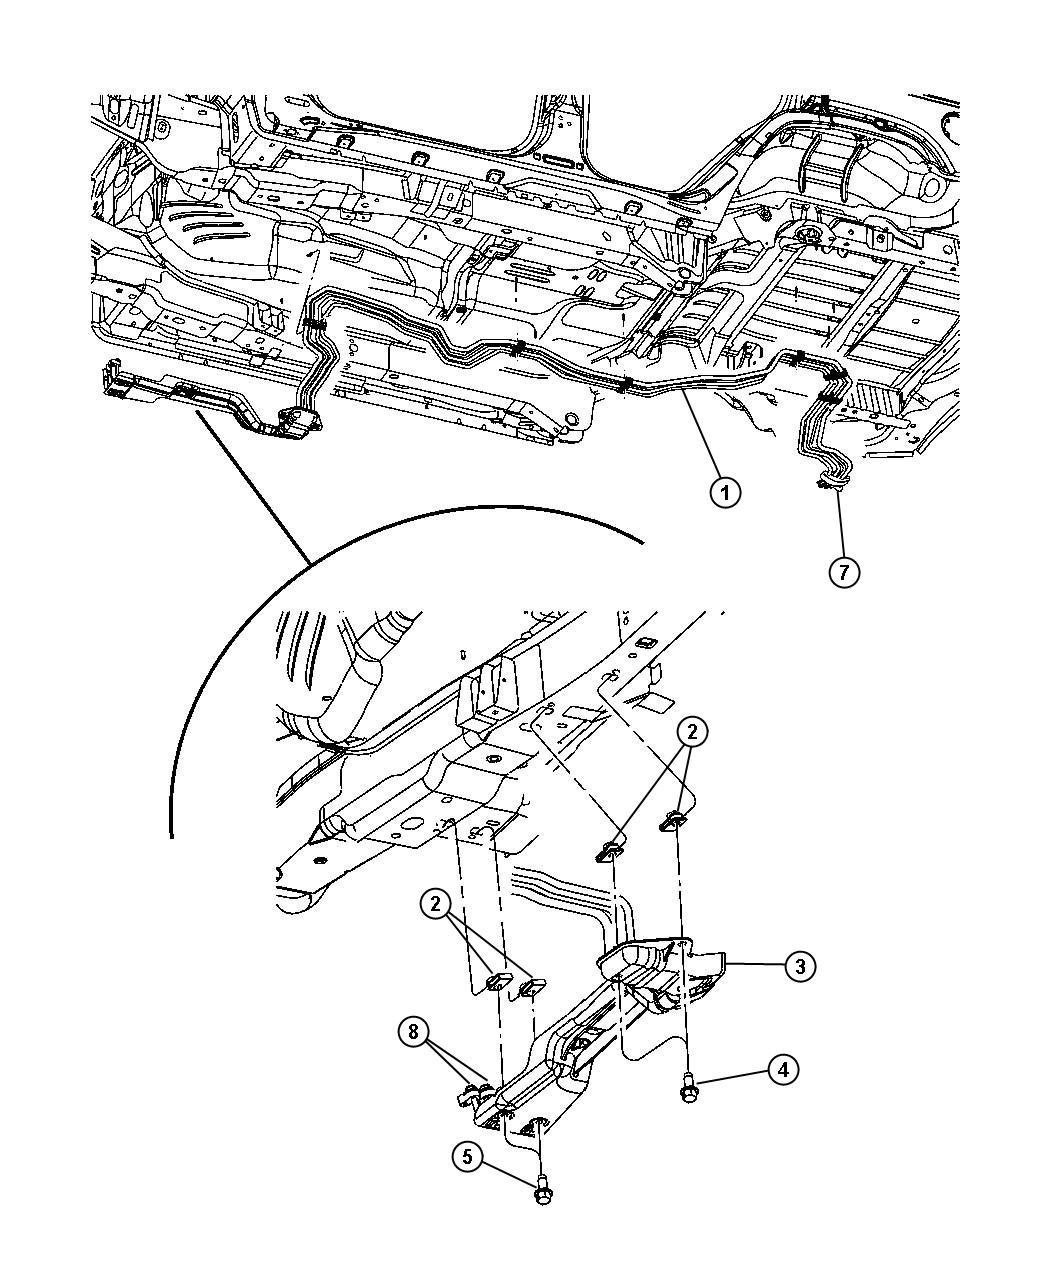 Jeep Commander 4x2, 3.7L V6, 5-Speed Automatic MB